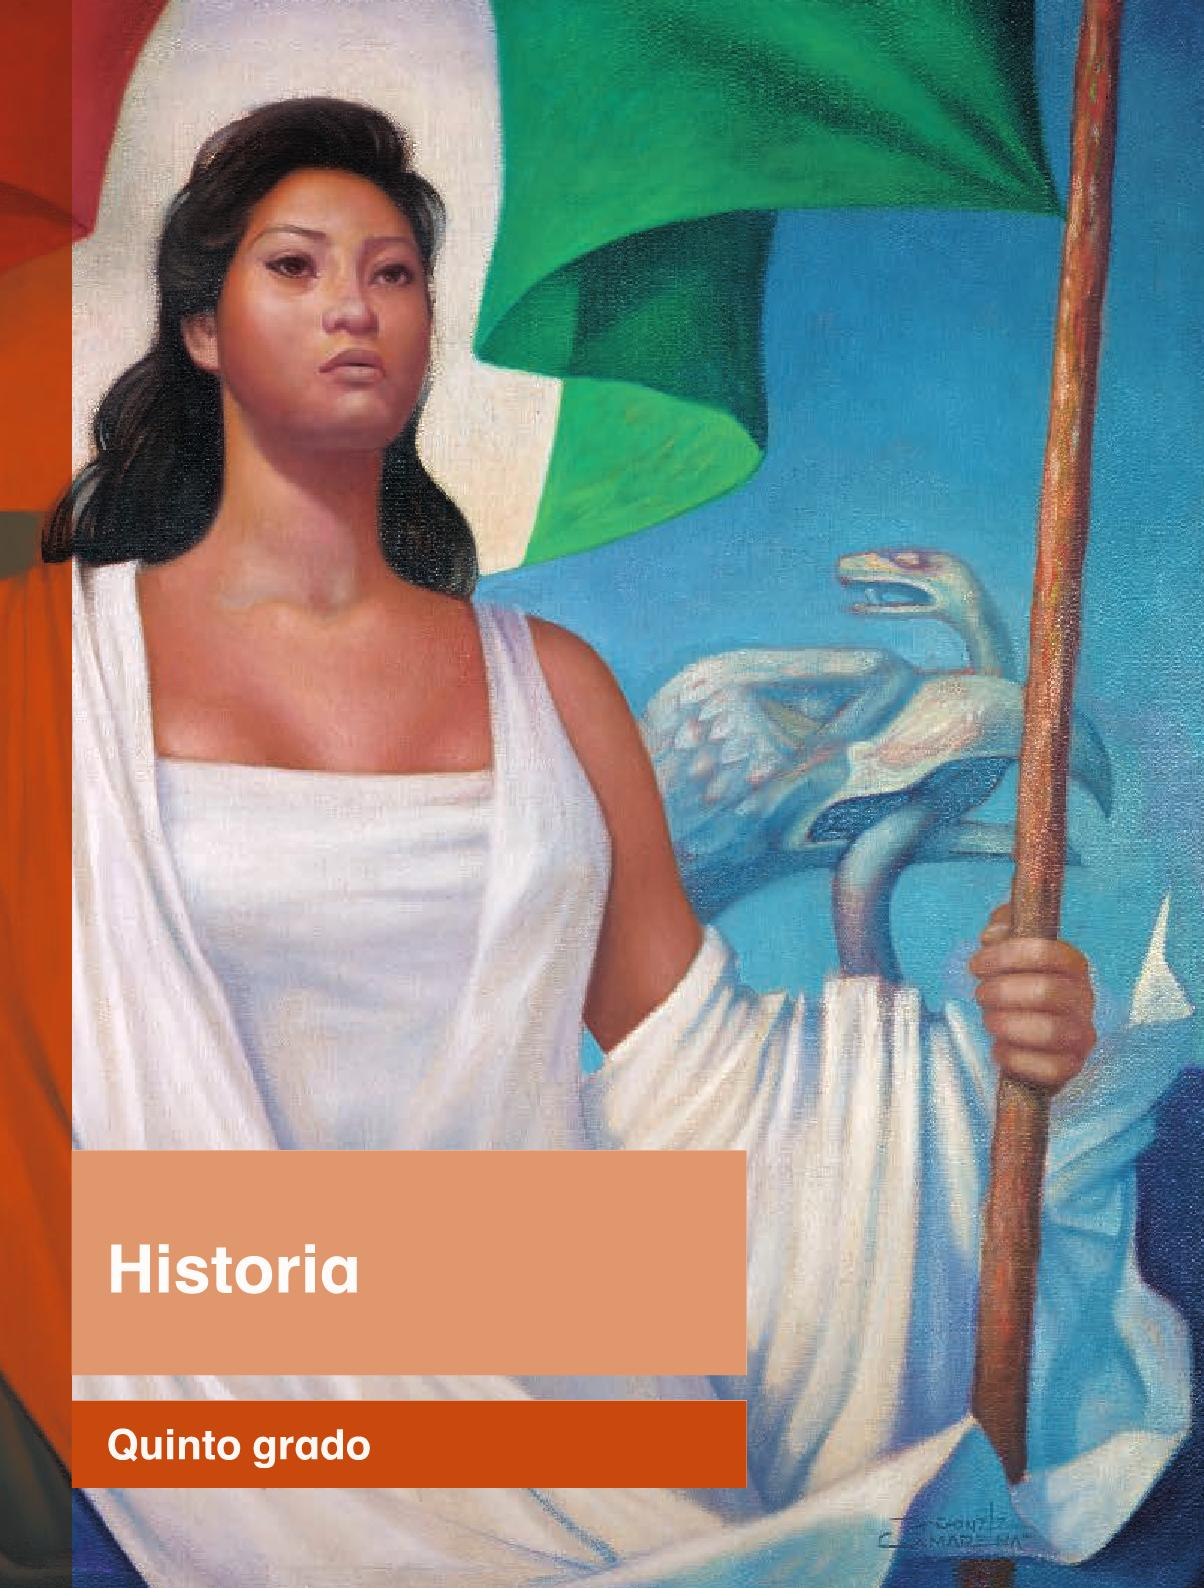 HistoriaquintoPagina 1